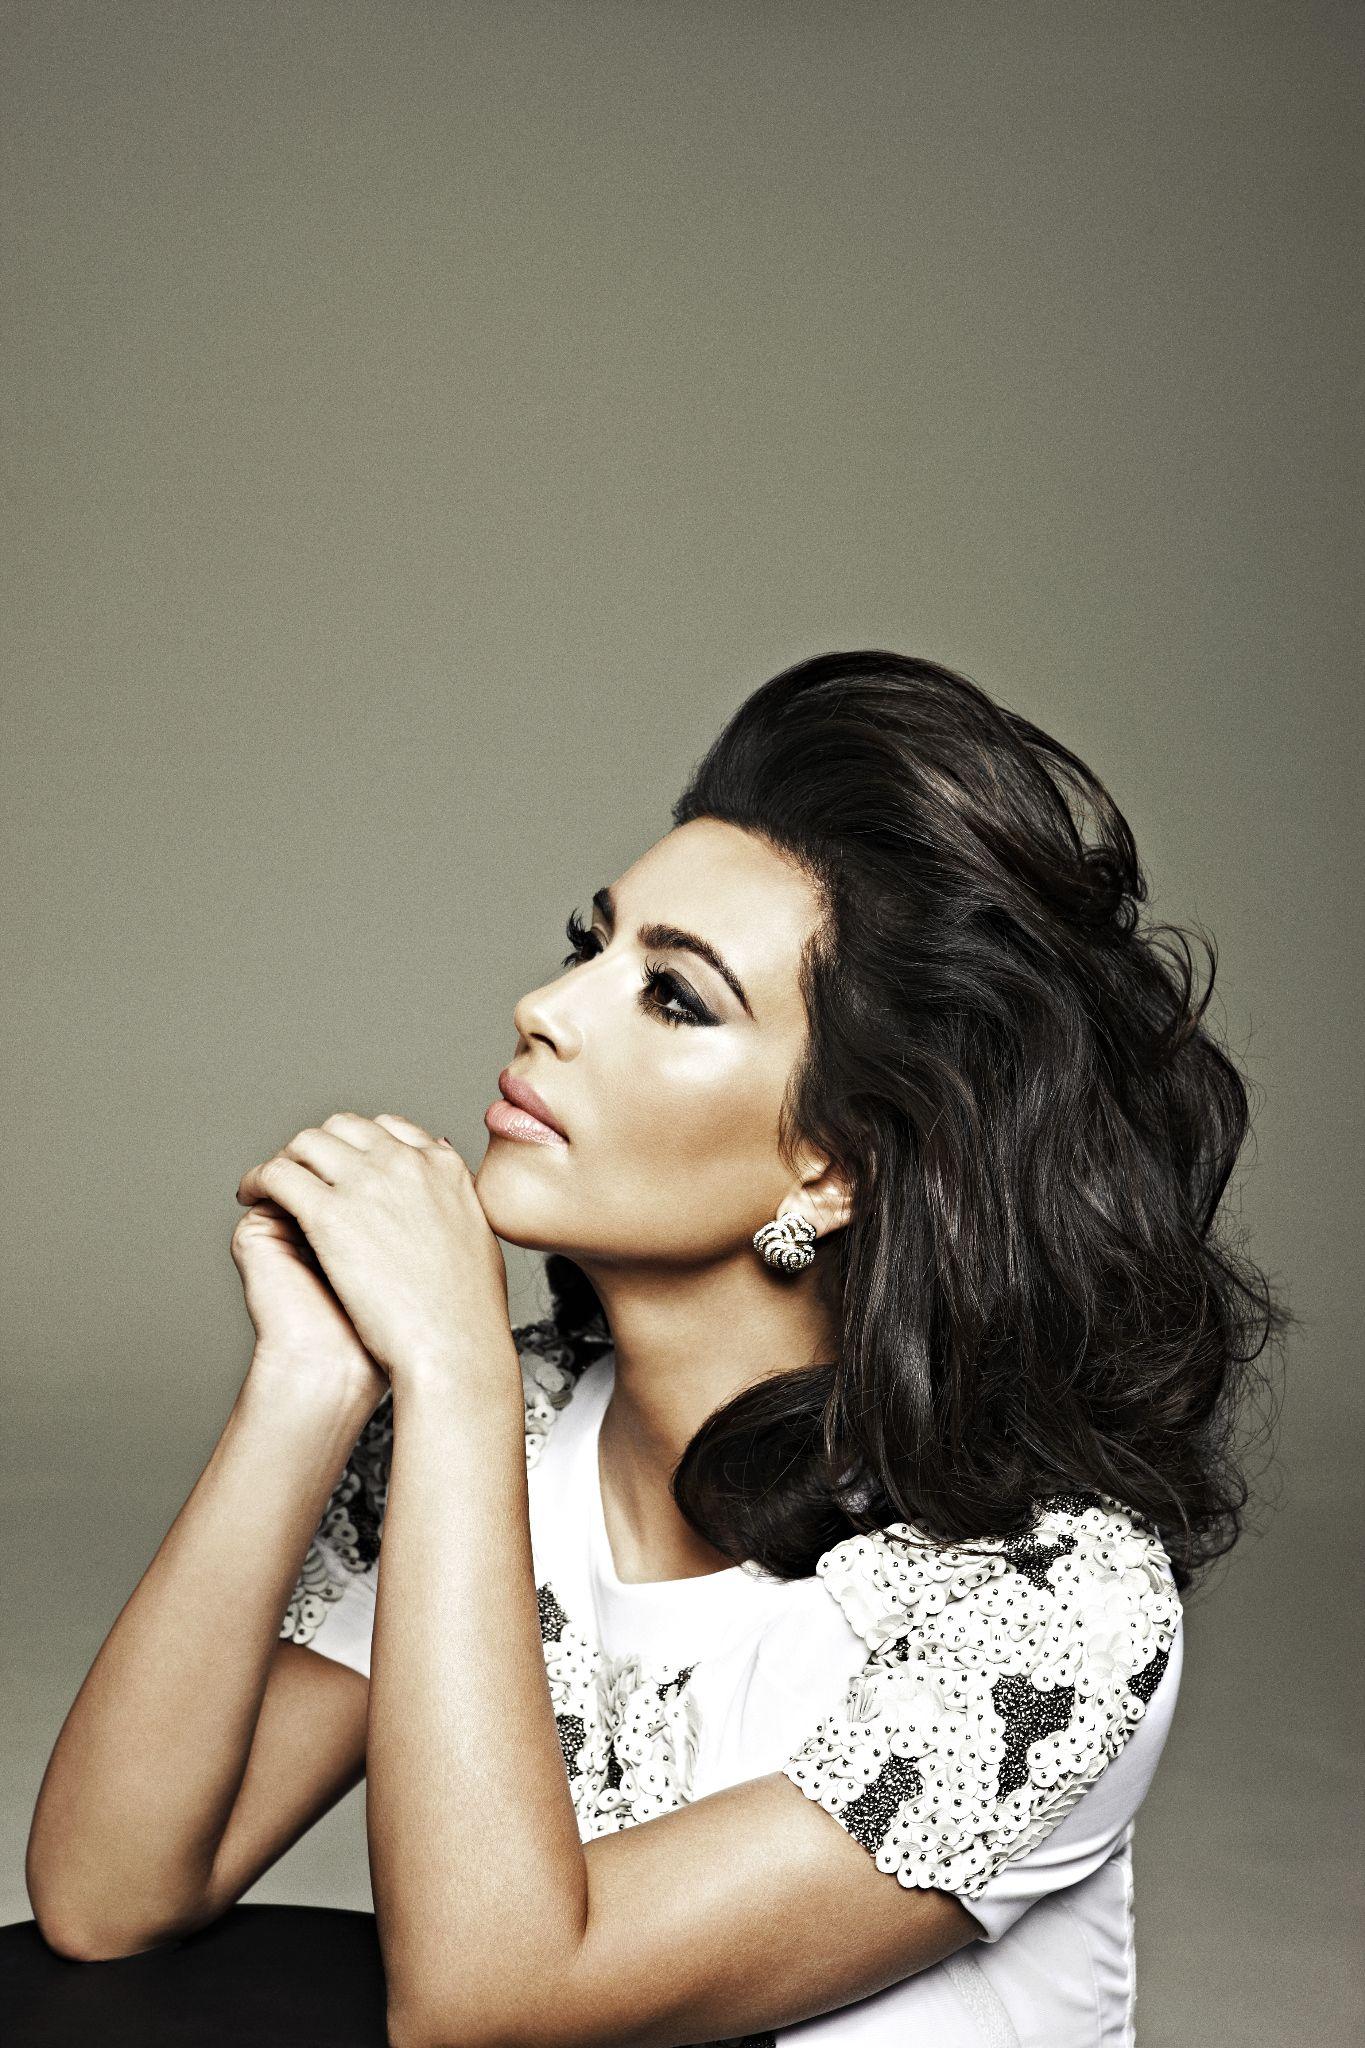 Kim kardashian kim kardashian pinterest kim kardashian